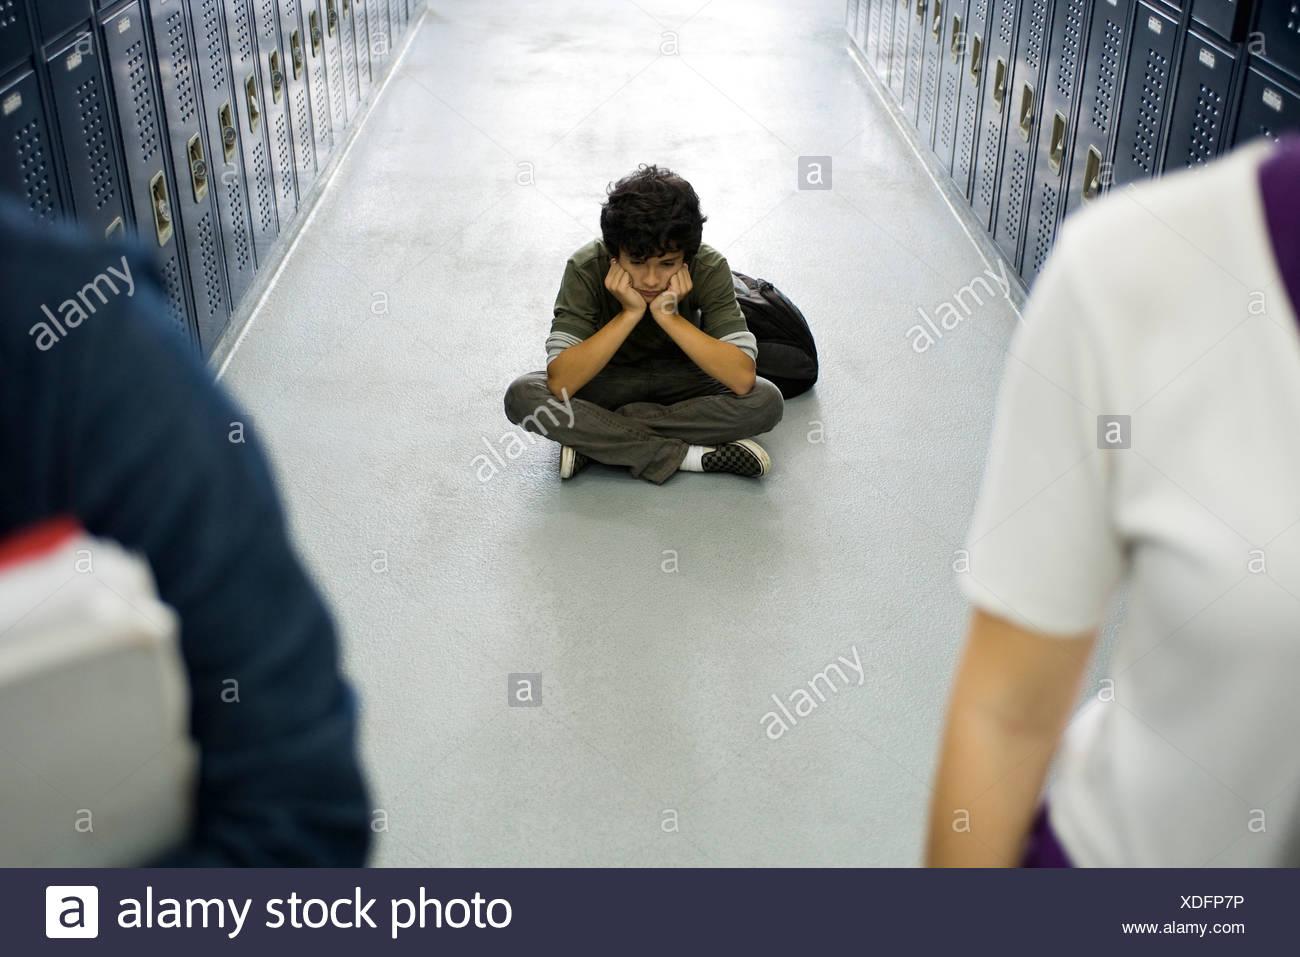 Teenage boy sitting sullenly on floor of school corridor, classmates in foreground - Stock Image